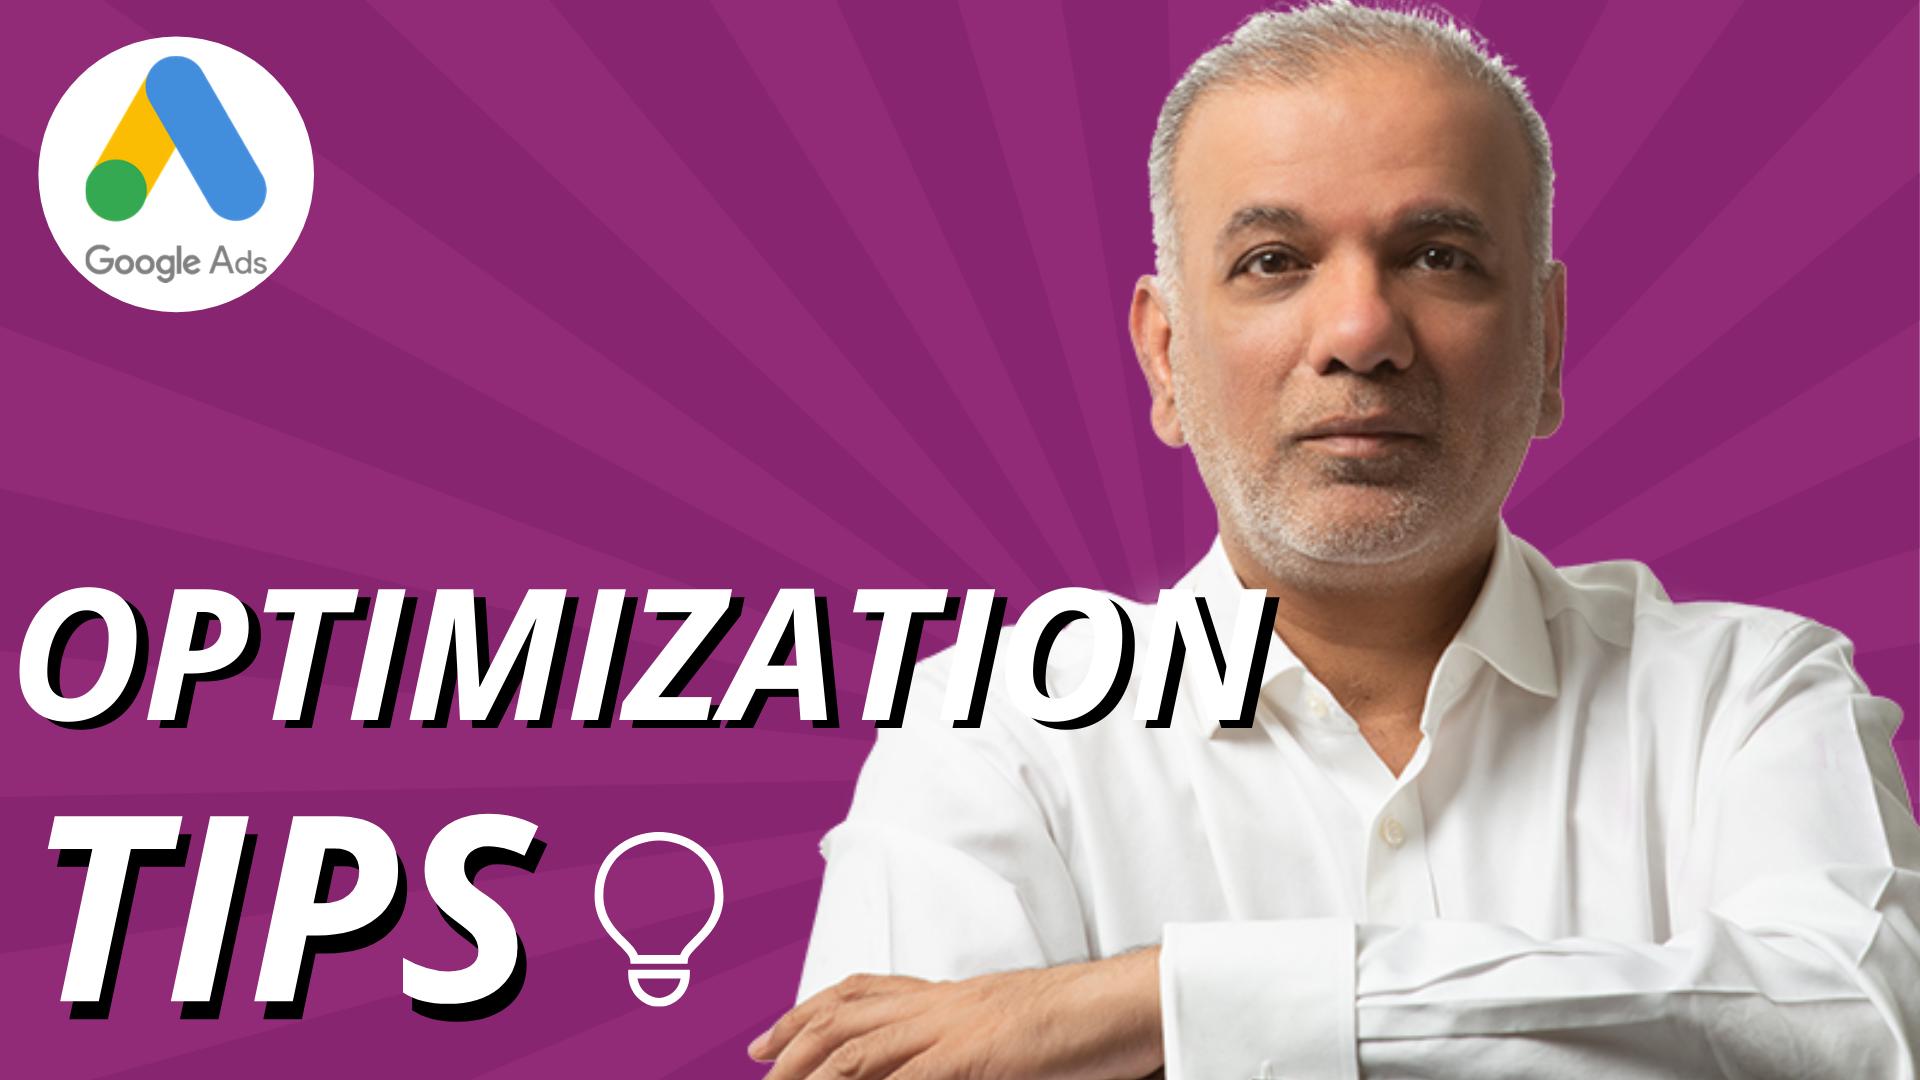 Google Ads Optimization Tips [Checklist]